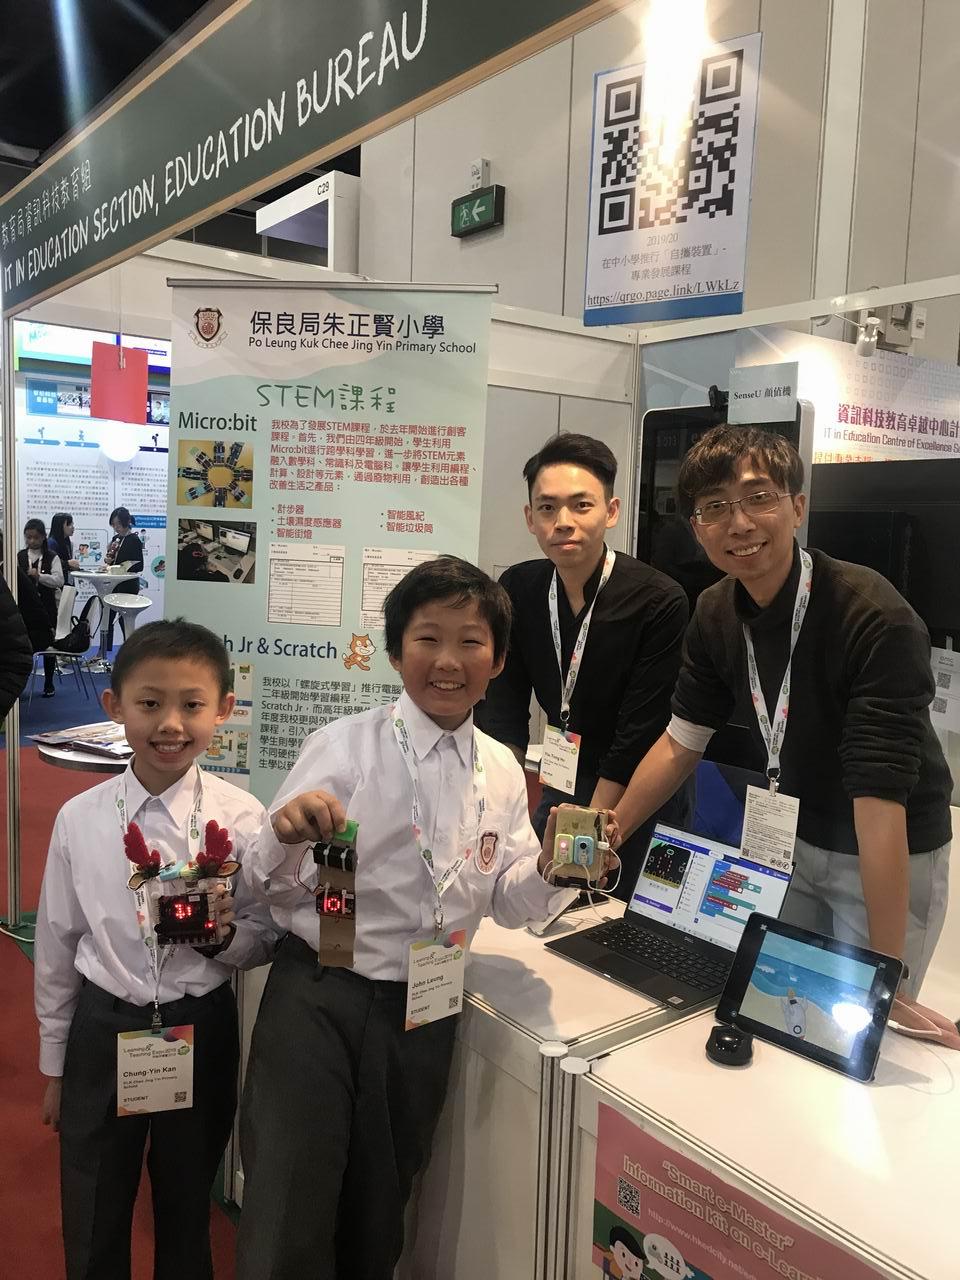 https://plkcjy.edu.hk/sites/default/files/xuan_zhuan_img_5702.jpg